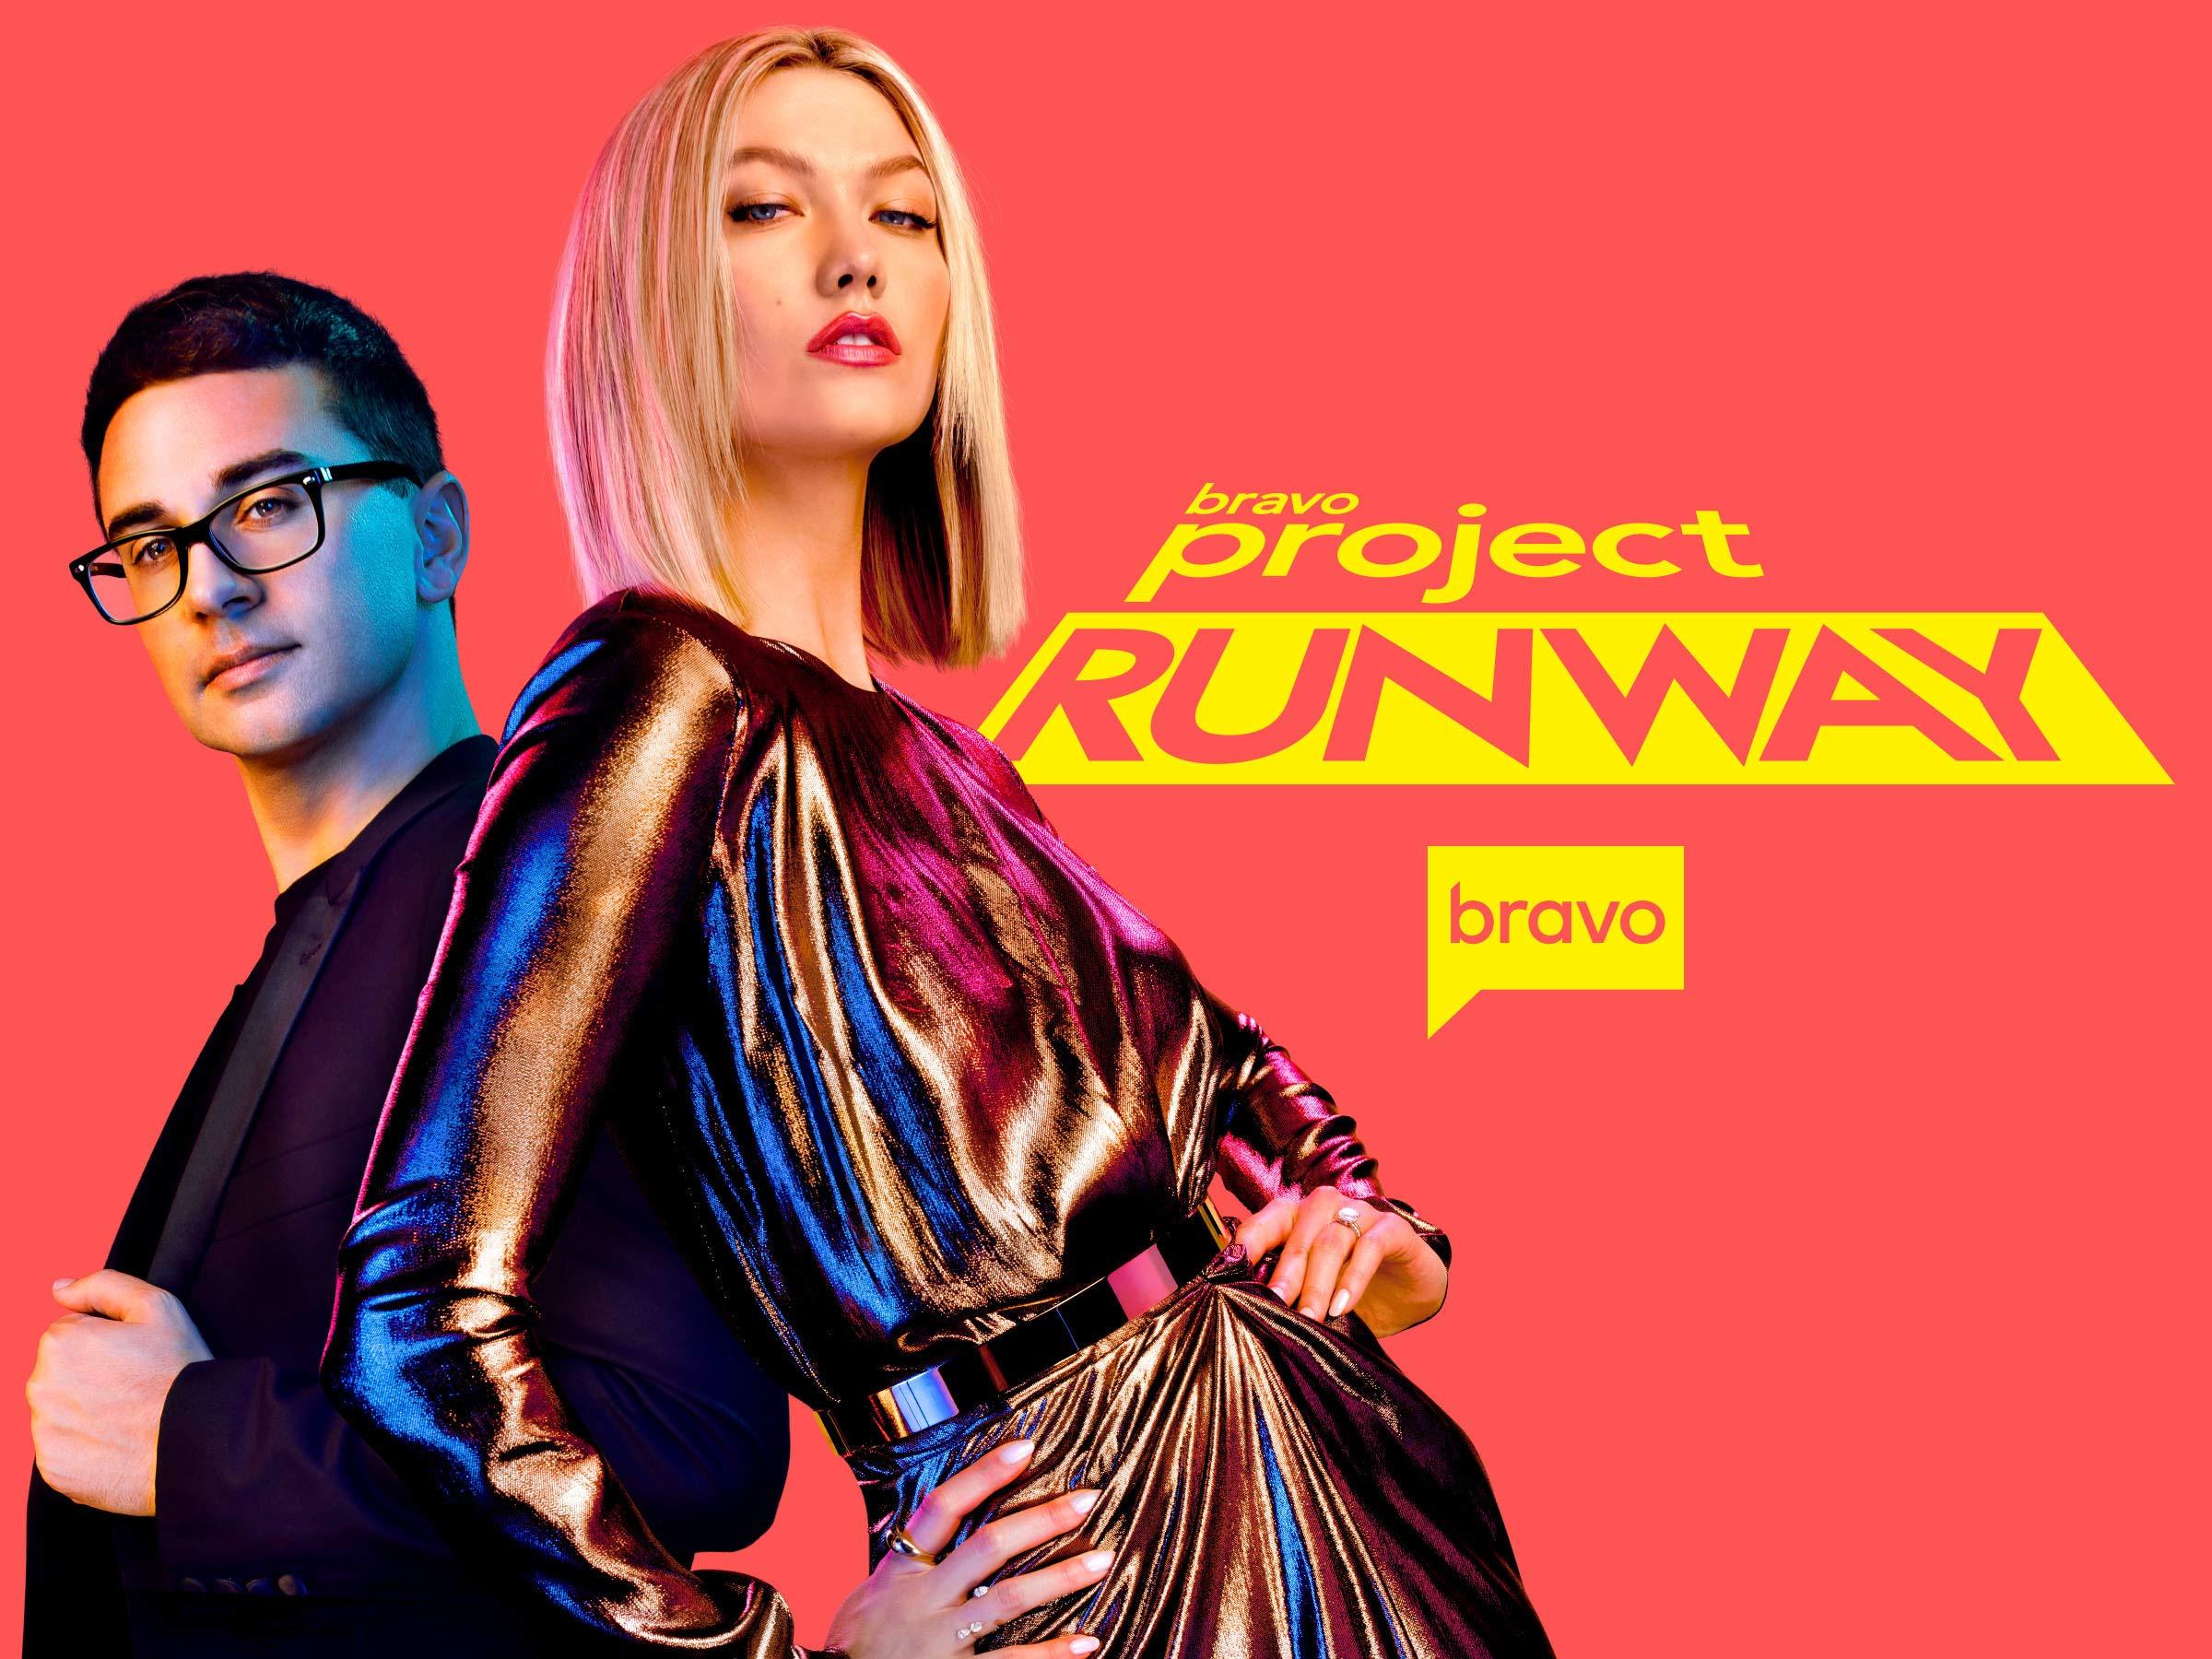 Project Runway Season 19 Bravo